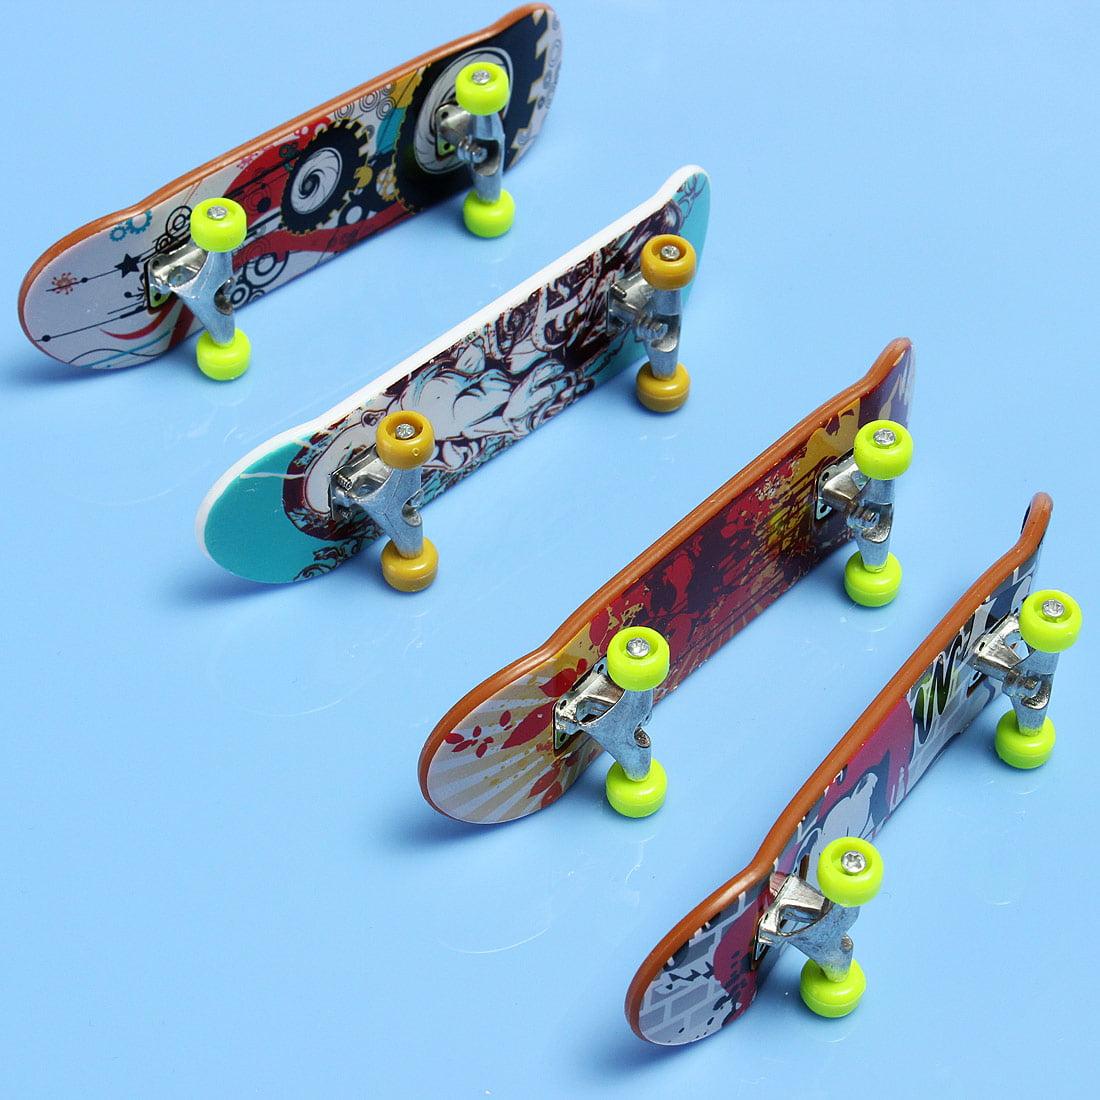 6 Pack Portable Mini Skateboard Random Pattern Finger Board Boy Kids Children Brain Development Games Toy Birthday Gift